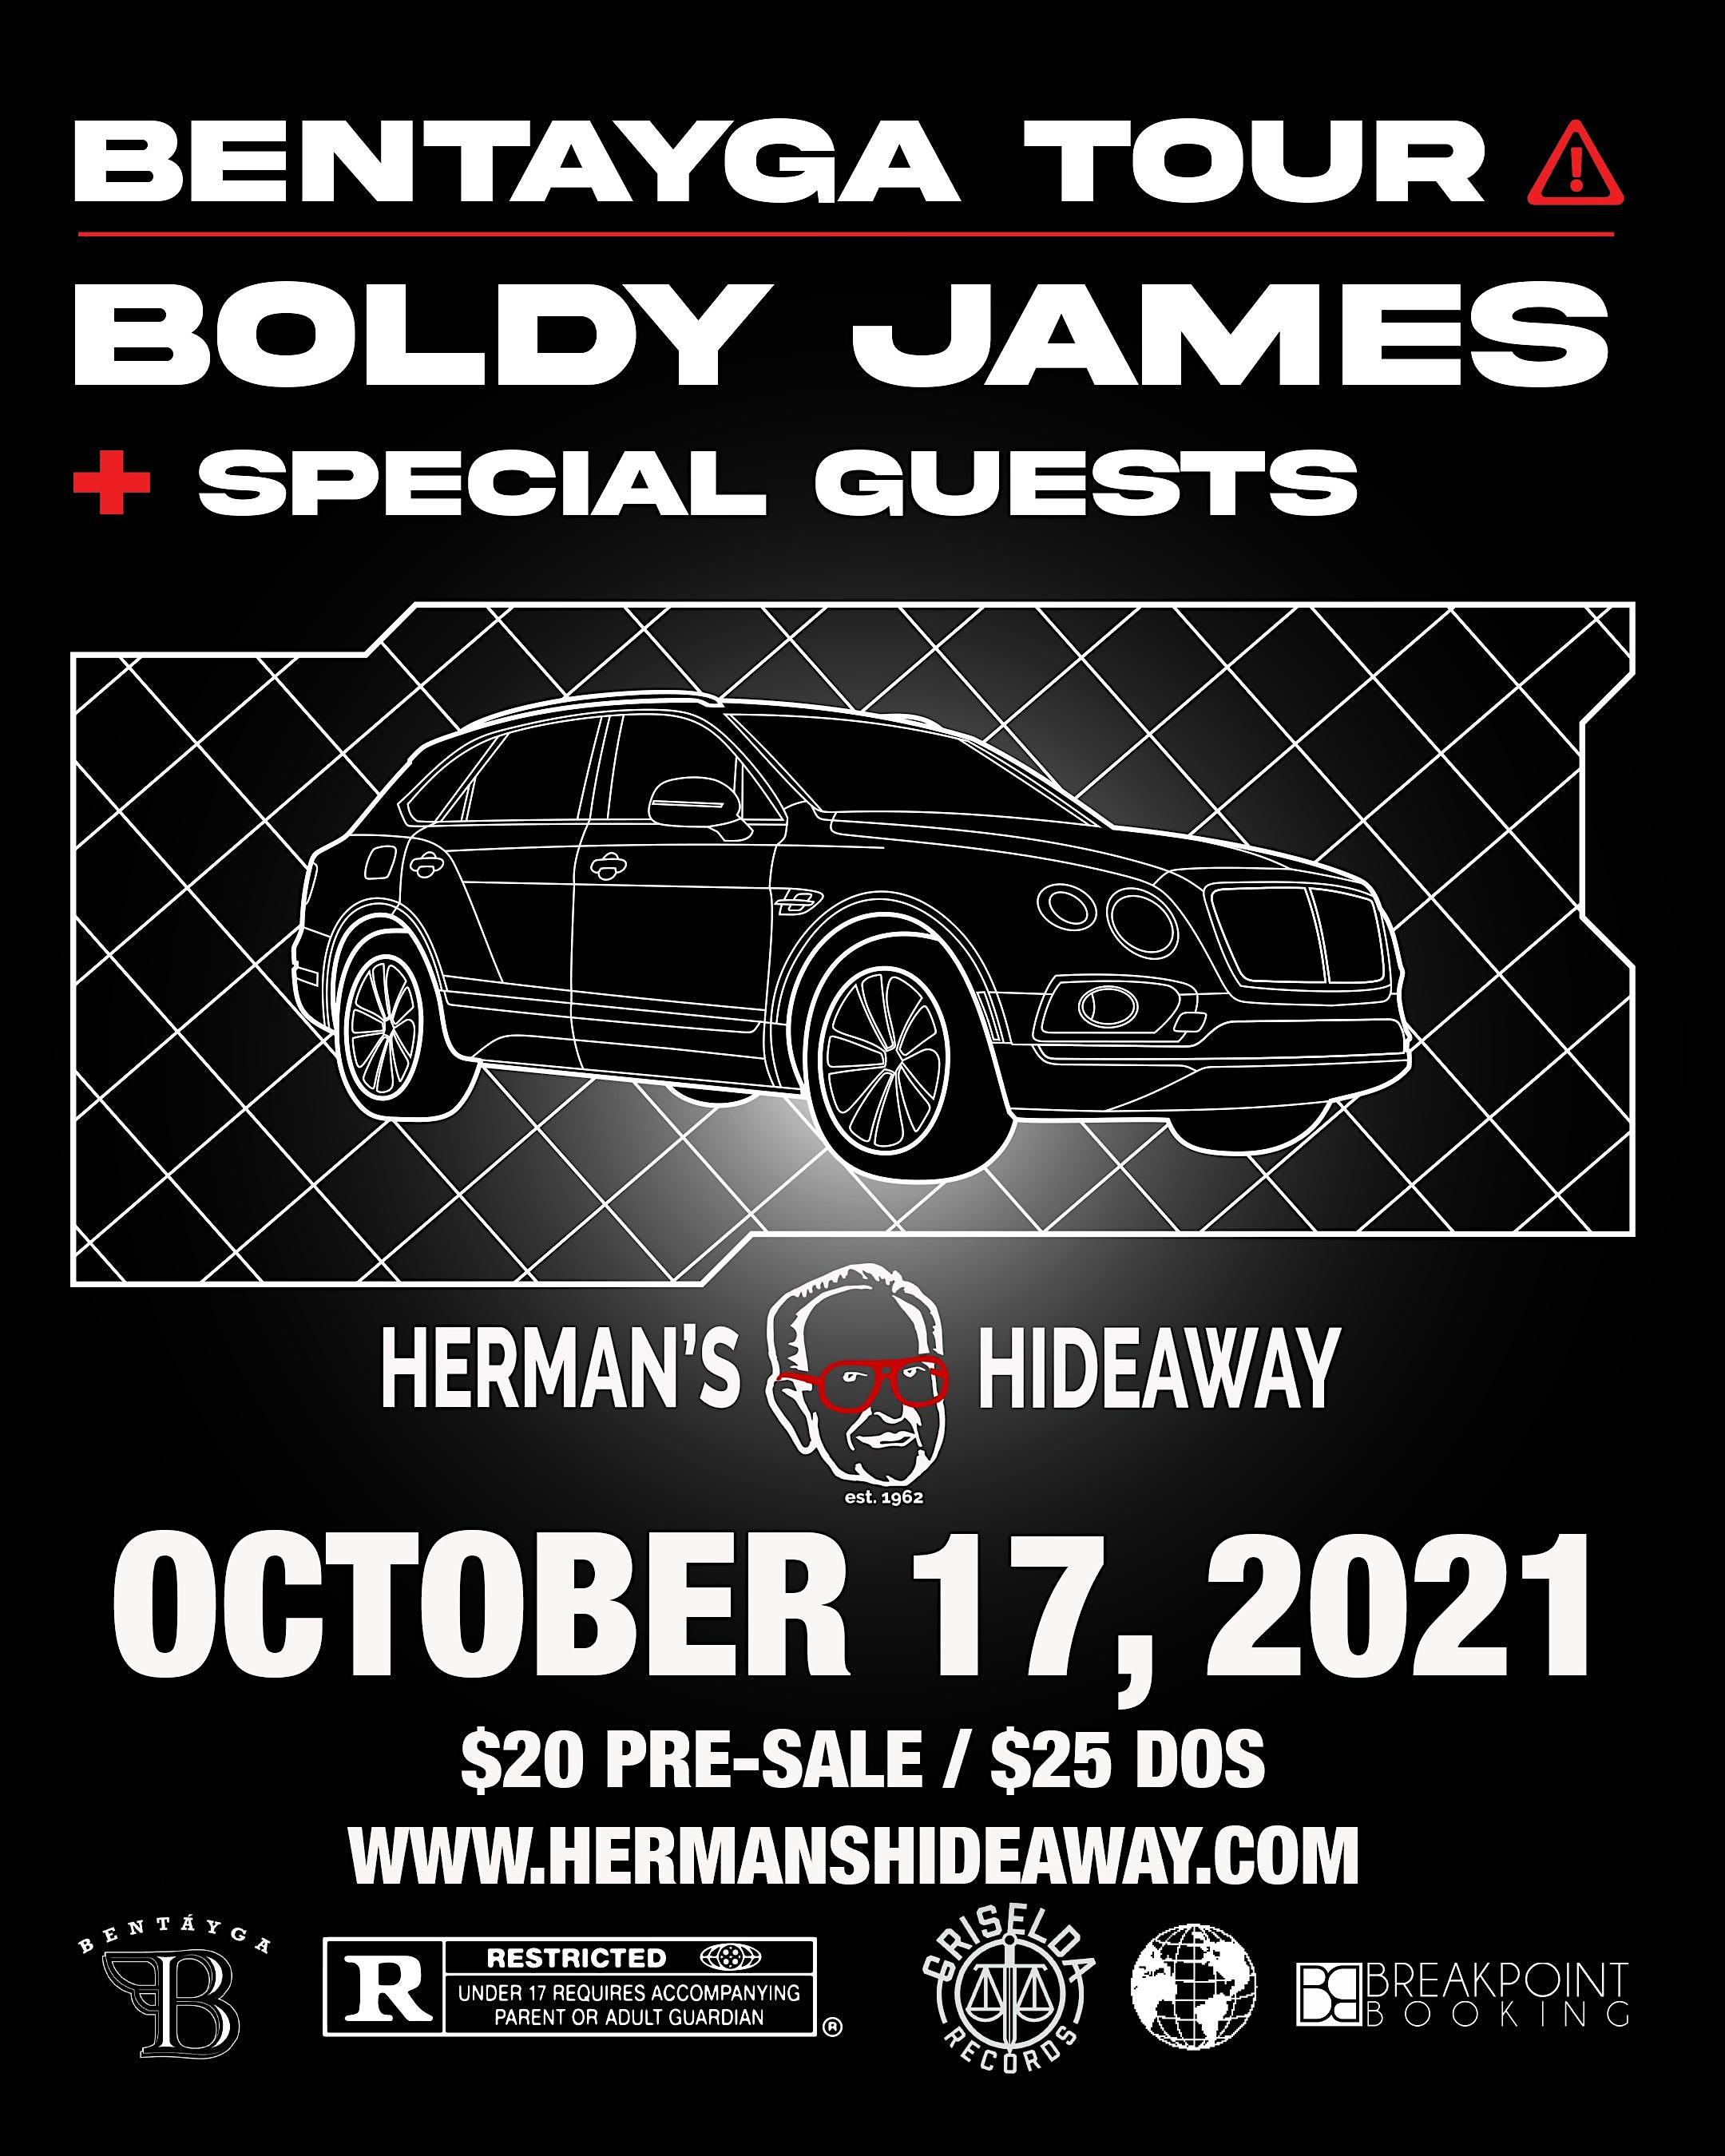 BENTAYGA TOUR – BOLDY JAMES + SPECIAL GUESTS